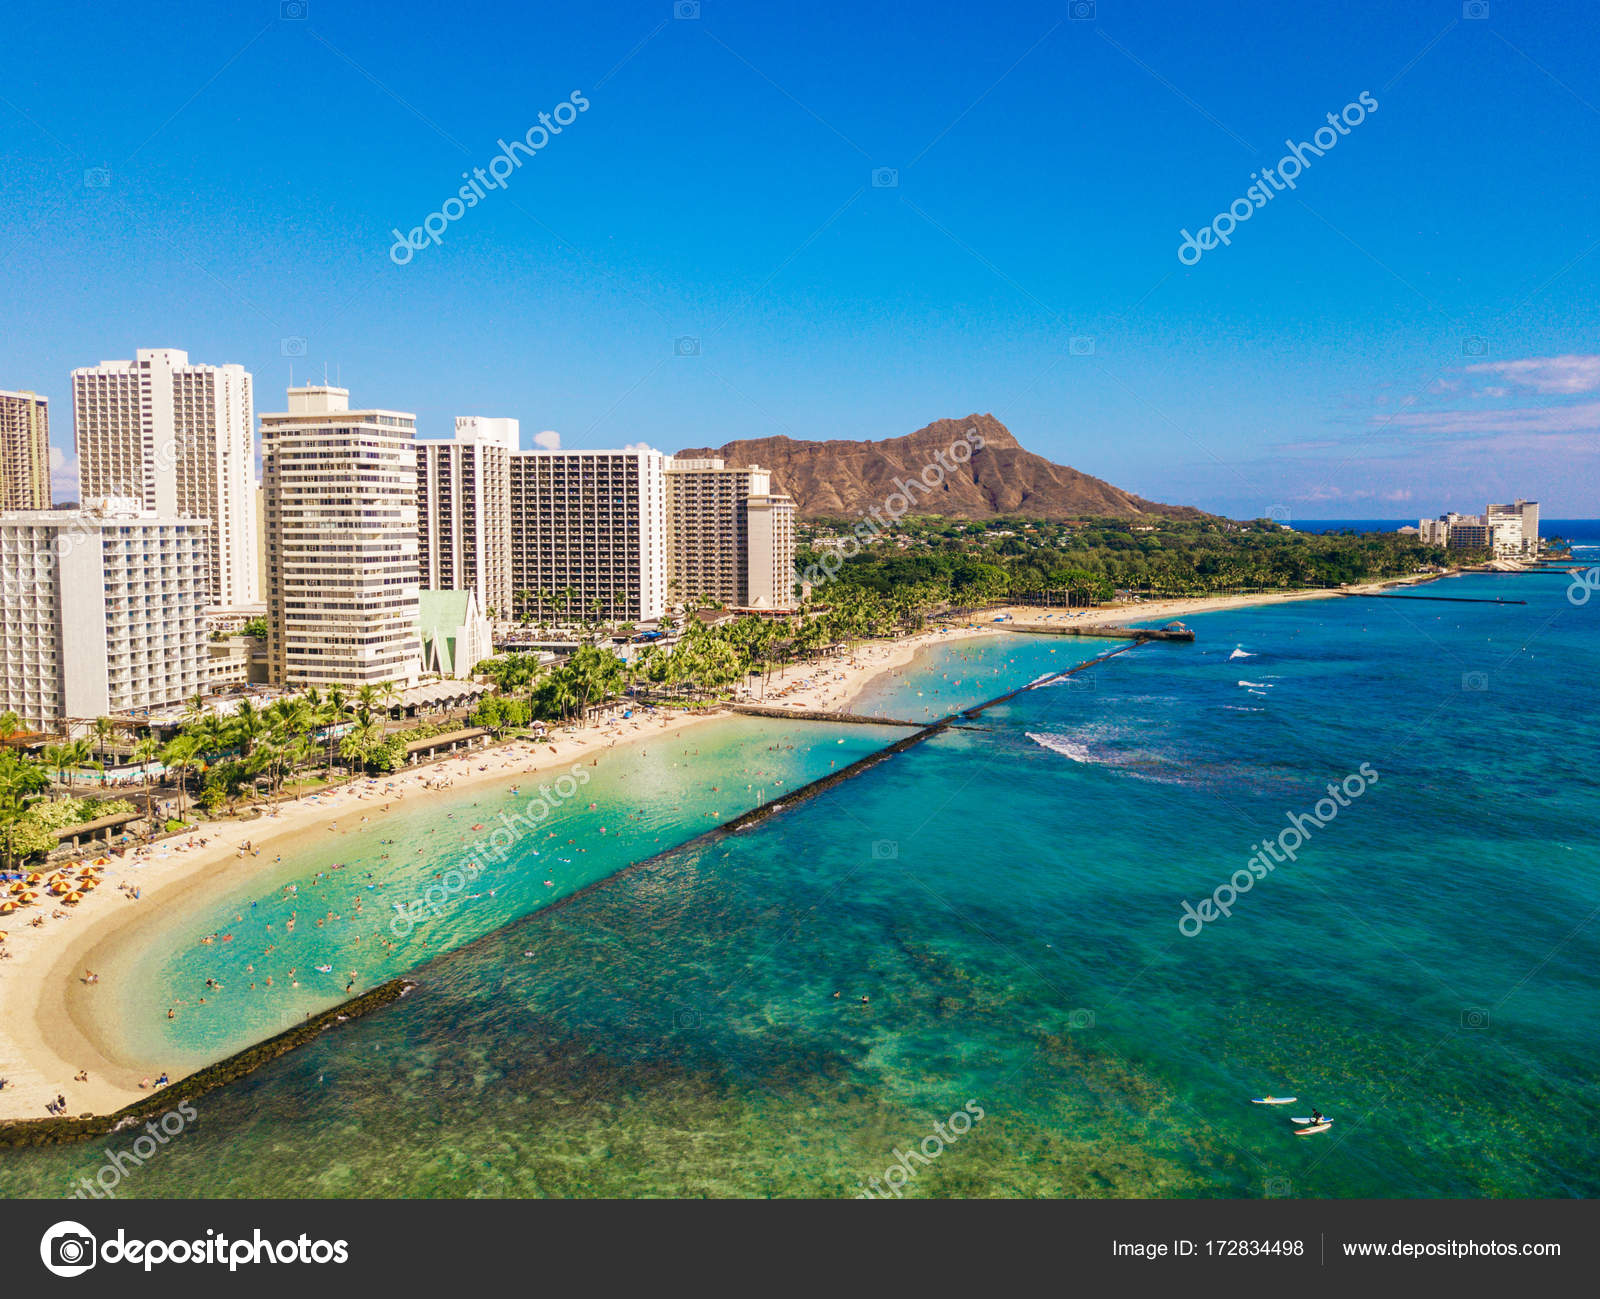 Honolulu Hawaii Aerial Skyline View Of Diamond Head Volcano Including The Hotels And Buildings On Waikiki Beach